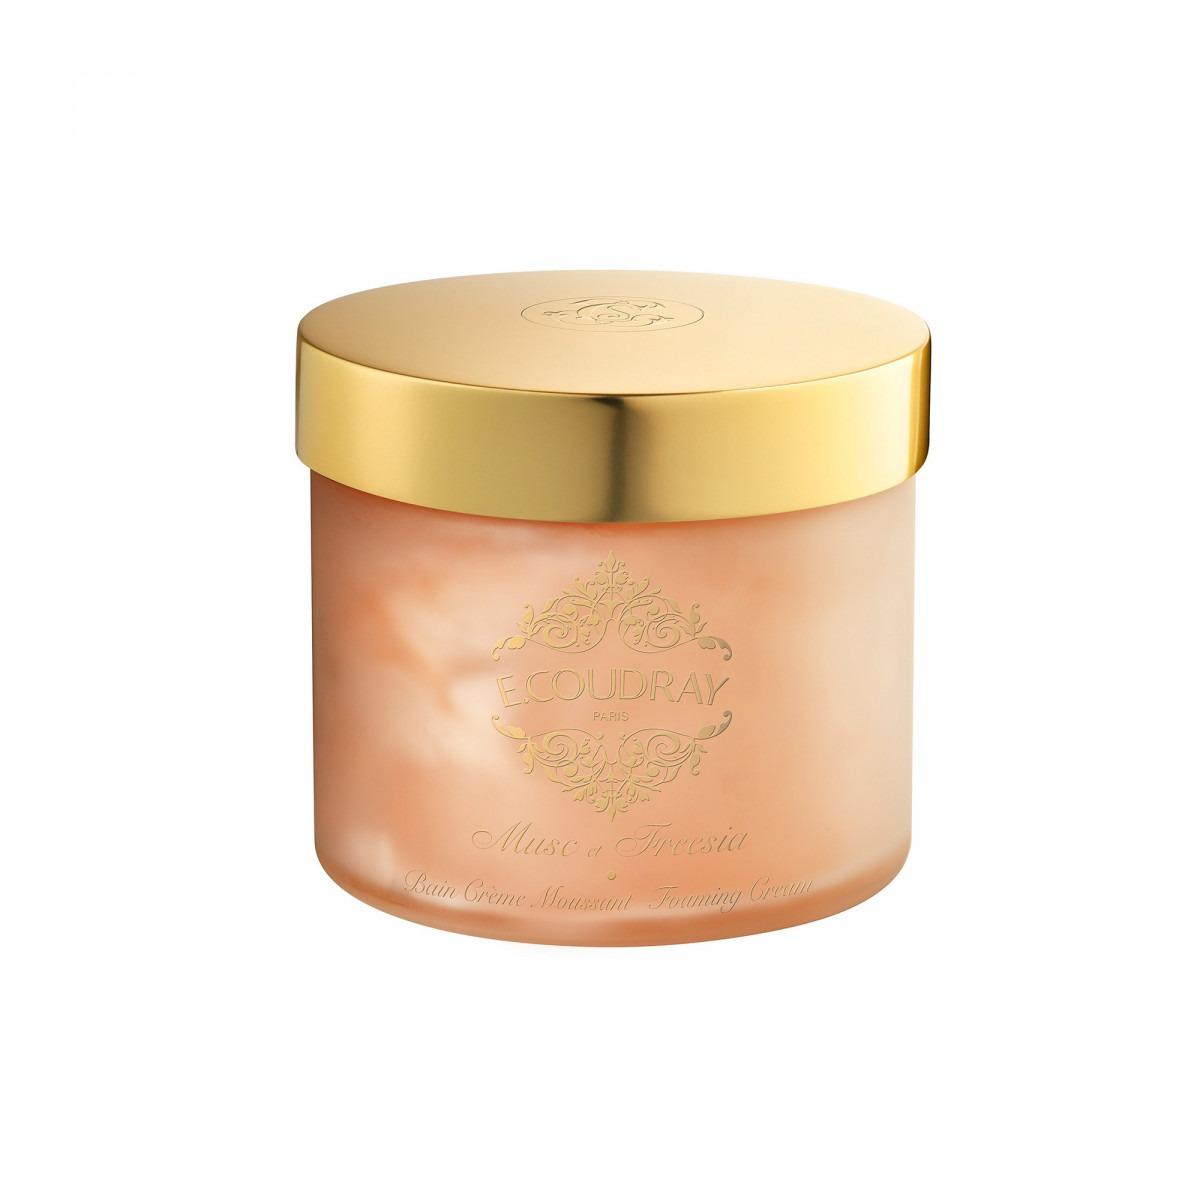 E. Coudray bath mousse glass jar musc et freesia 250ml